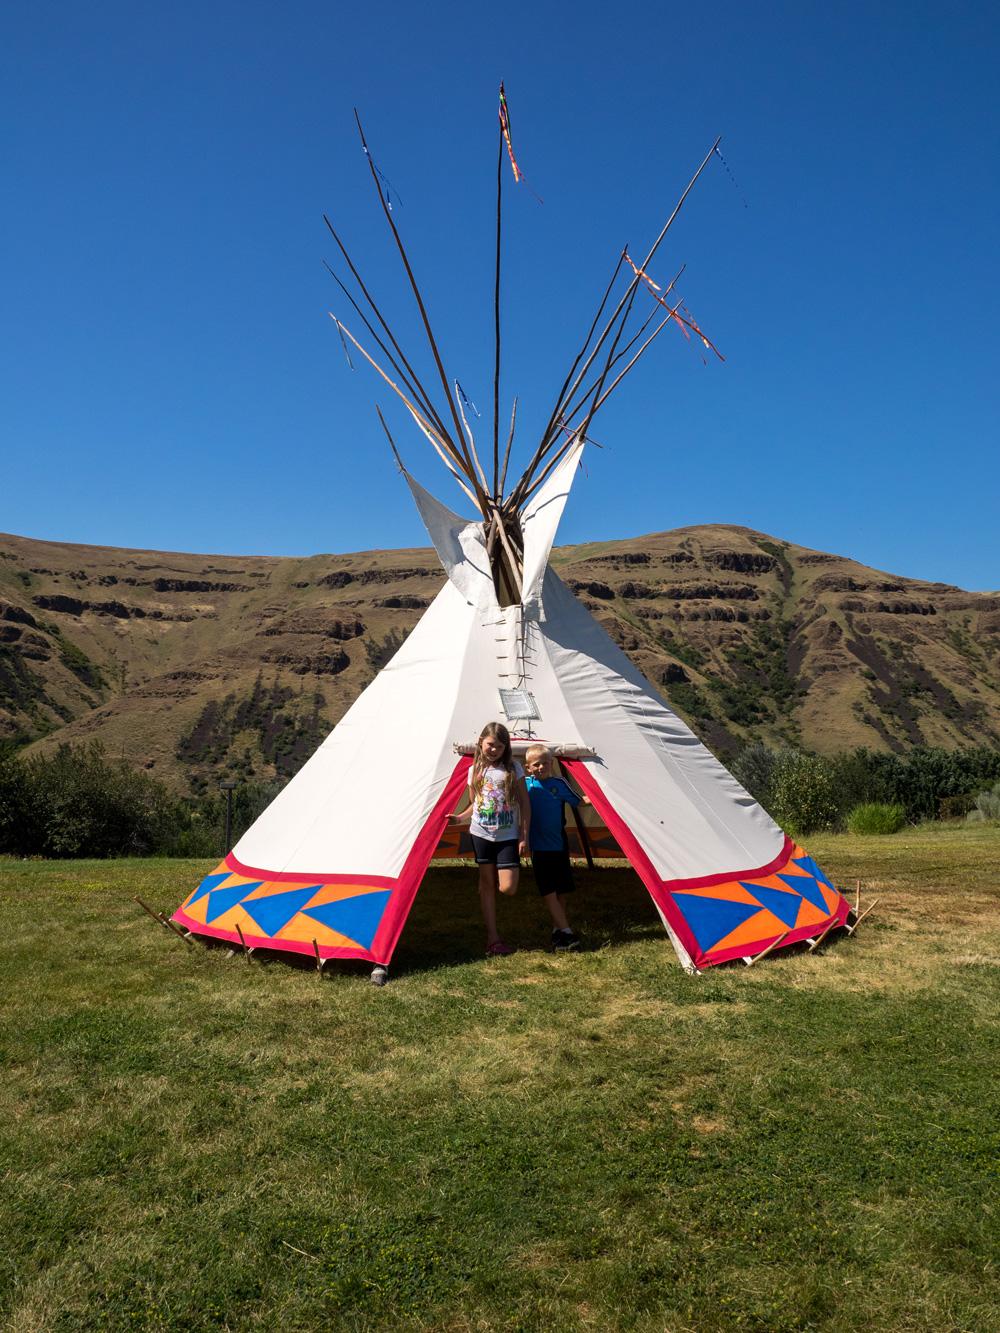 Nez Perce National Historical Park teepee. www.adventuringbeyond.com